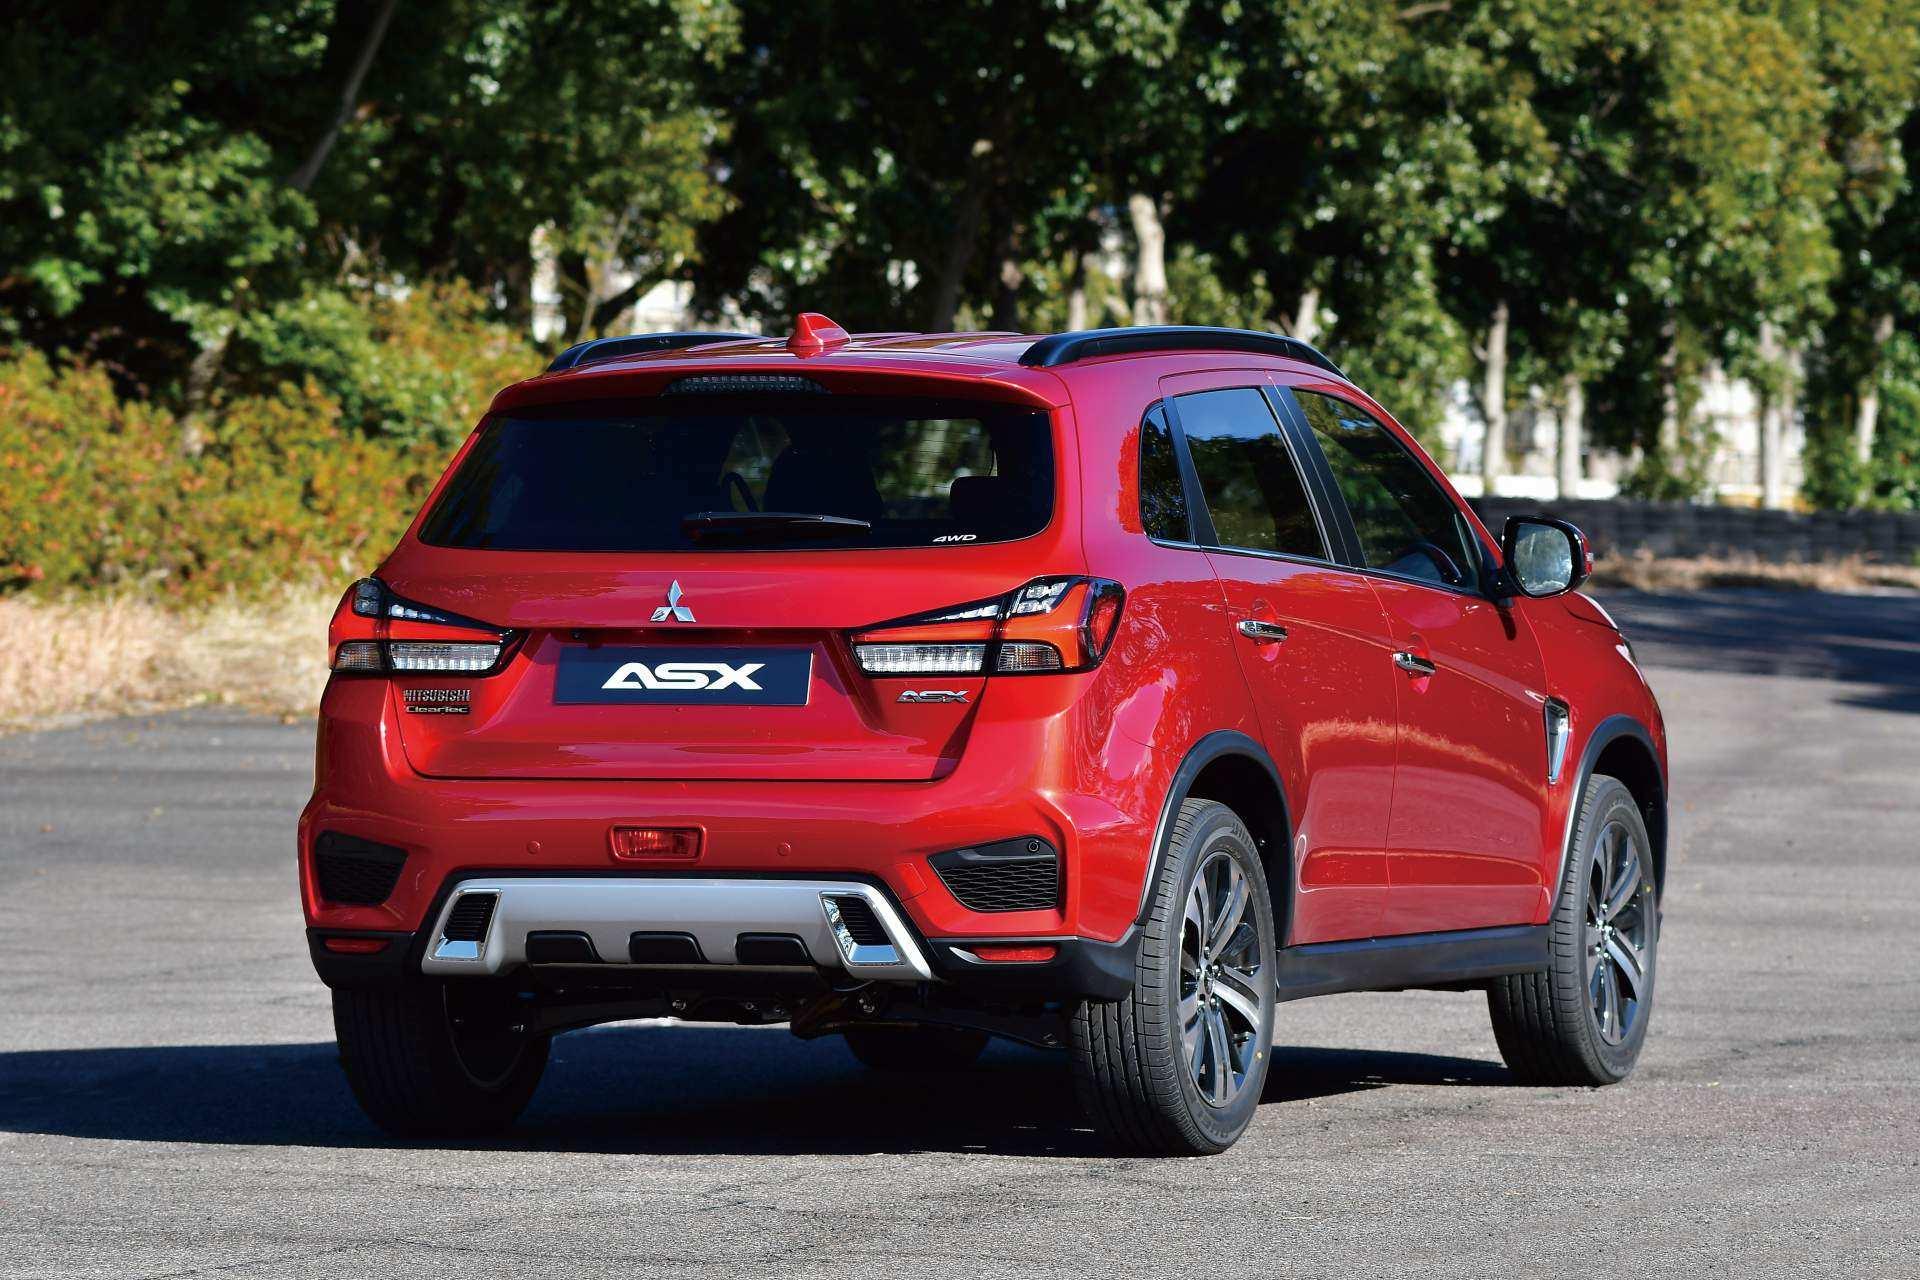 97 All New Mitsubishi Asx 2020 Dane Techniczne Exterior and Interior by Mitsubishi Asx 2020 Dane Techniczne